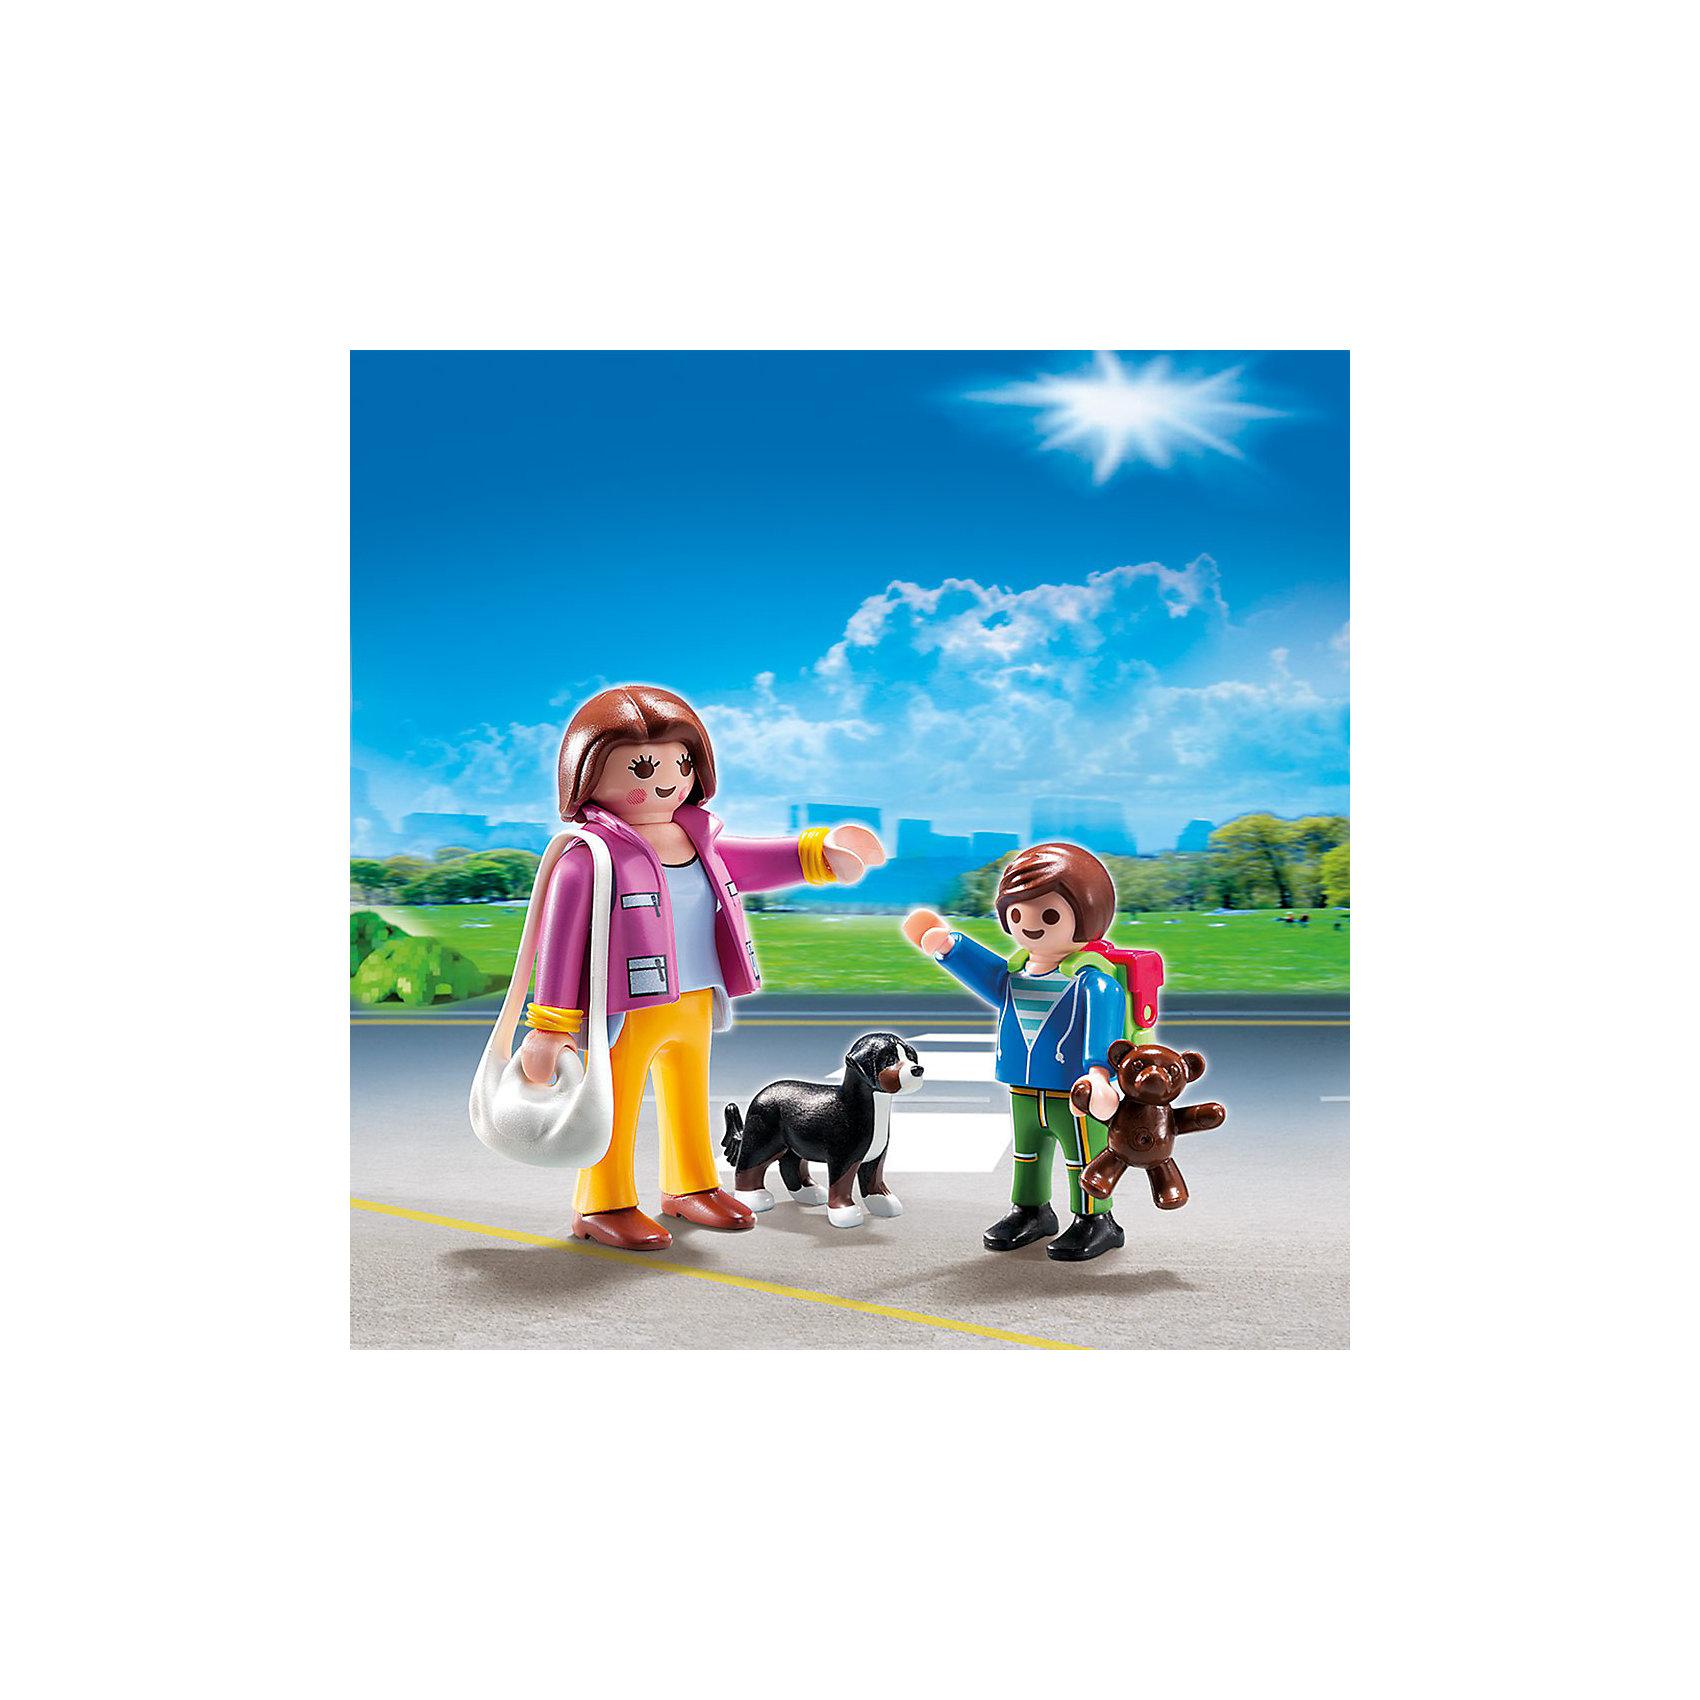 PLAYMOBIL 5513 Особняки: Набор Мама и школьник